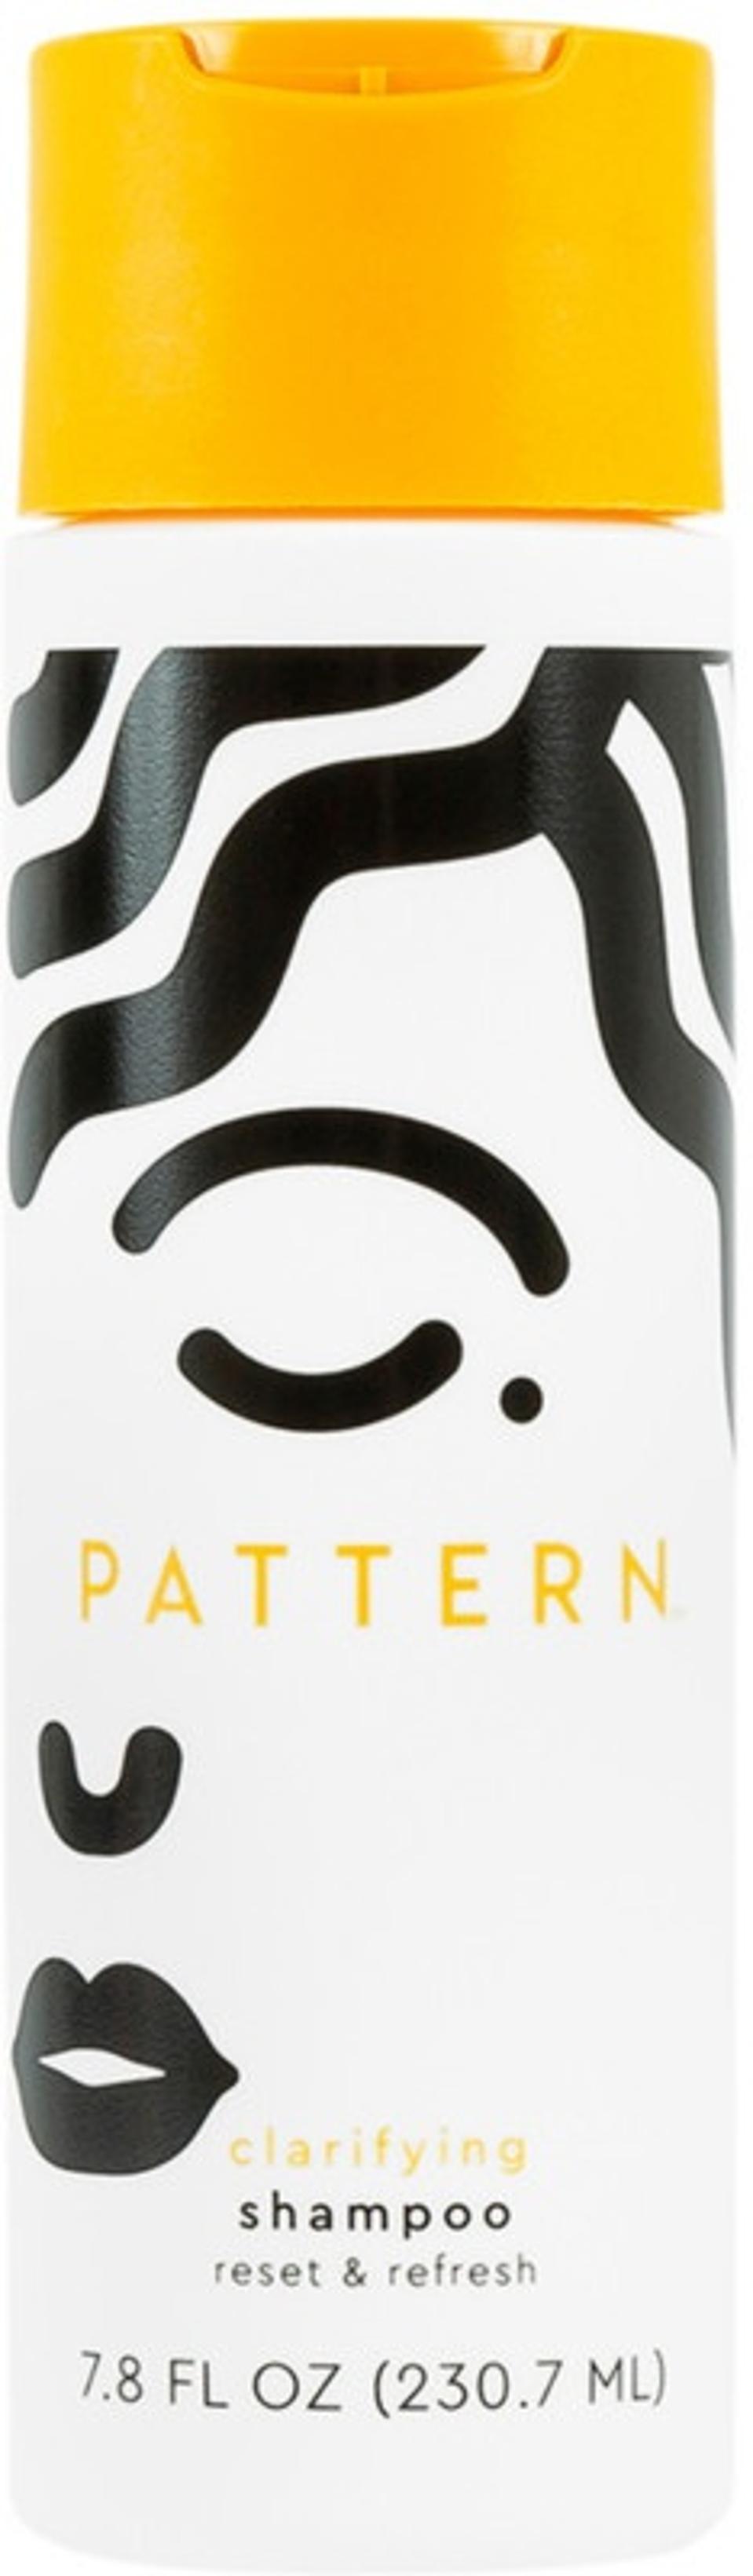 Pattern Clarifying Shampoo